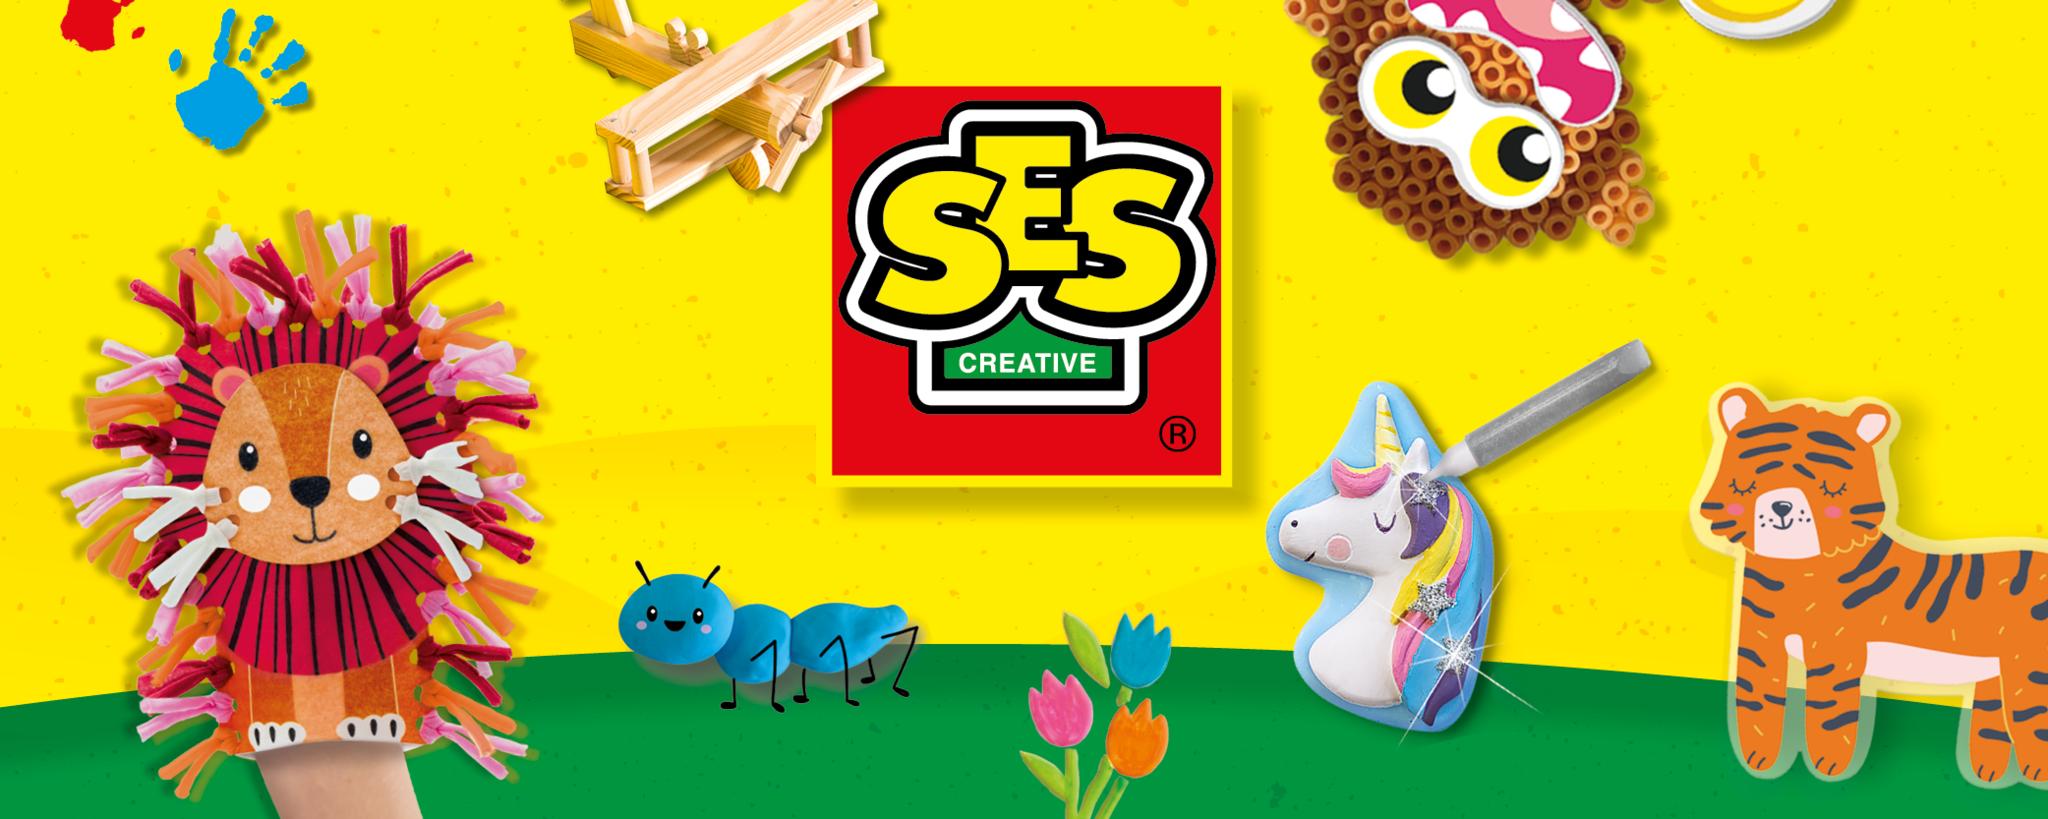 SES Creative - kreatives Spielzeug